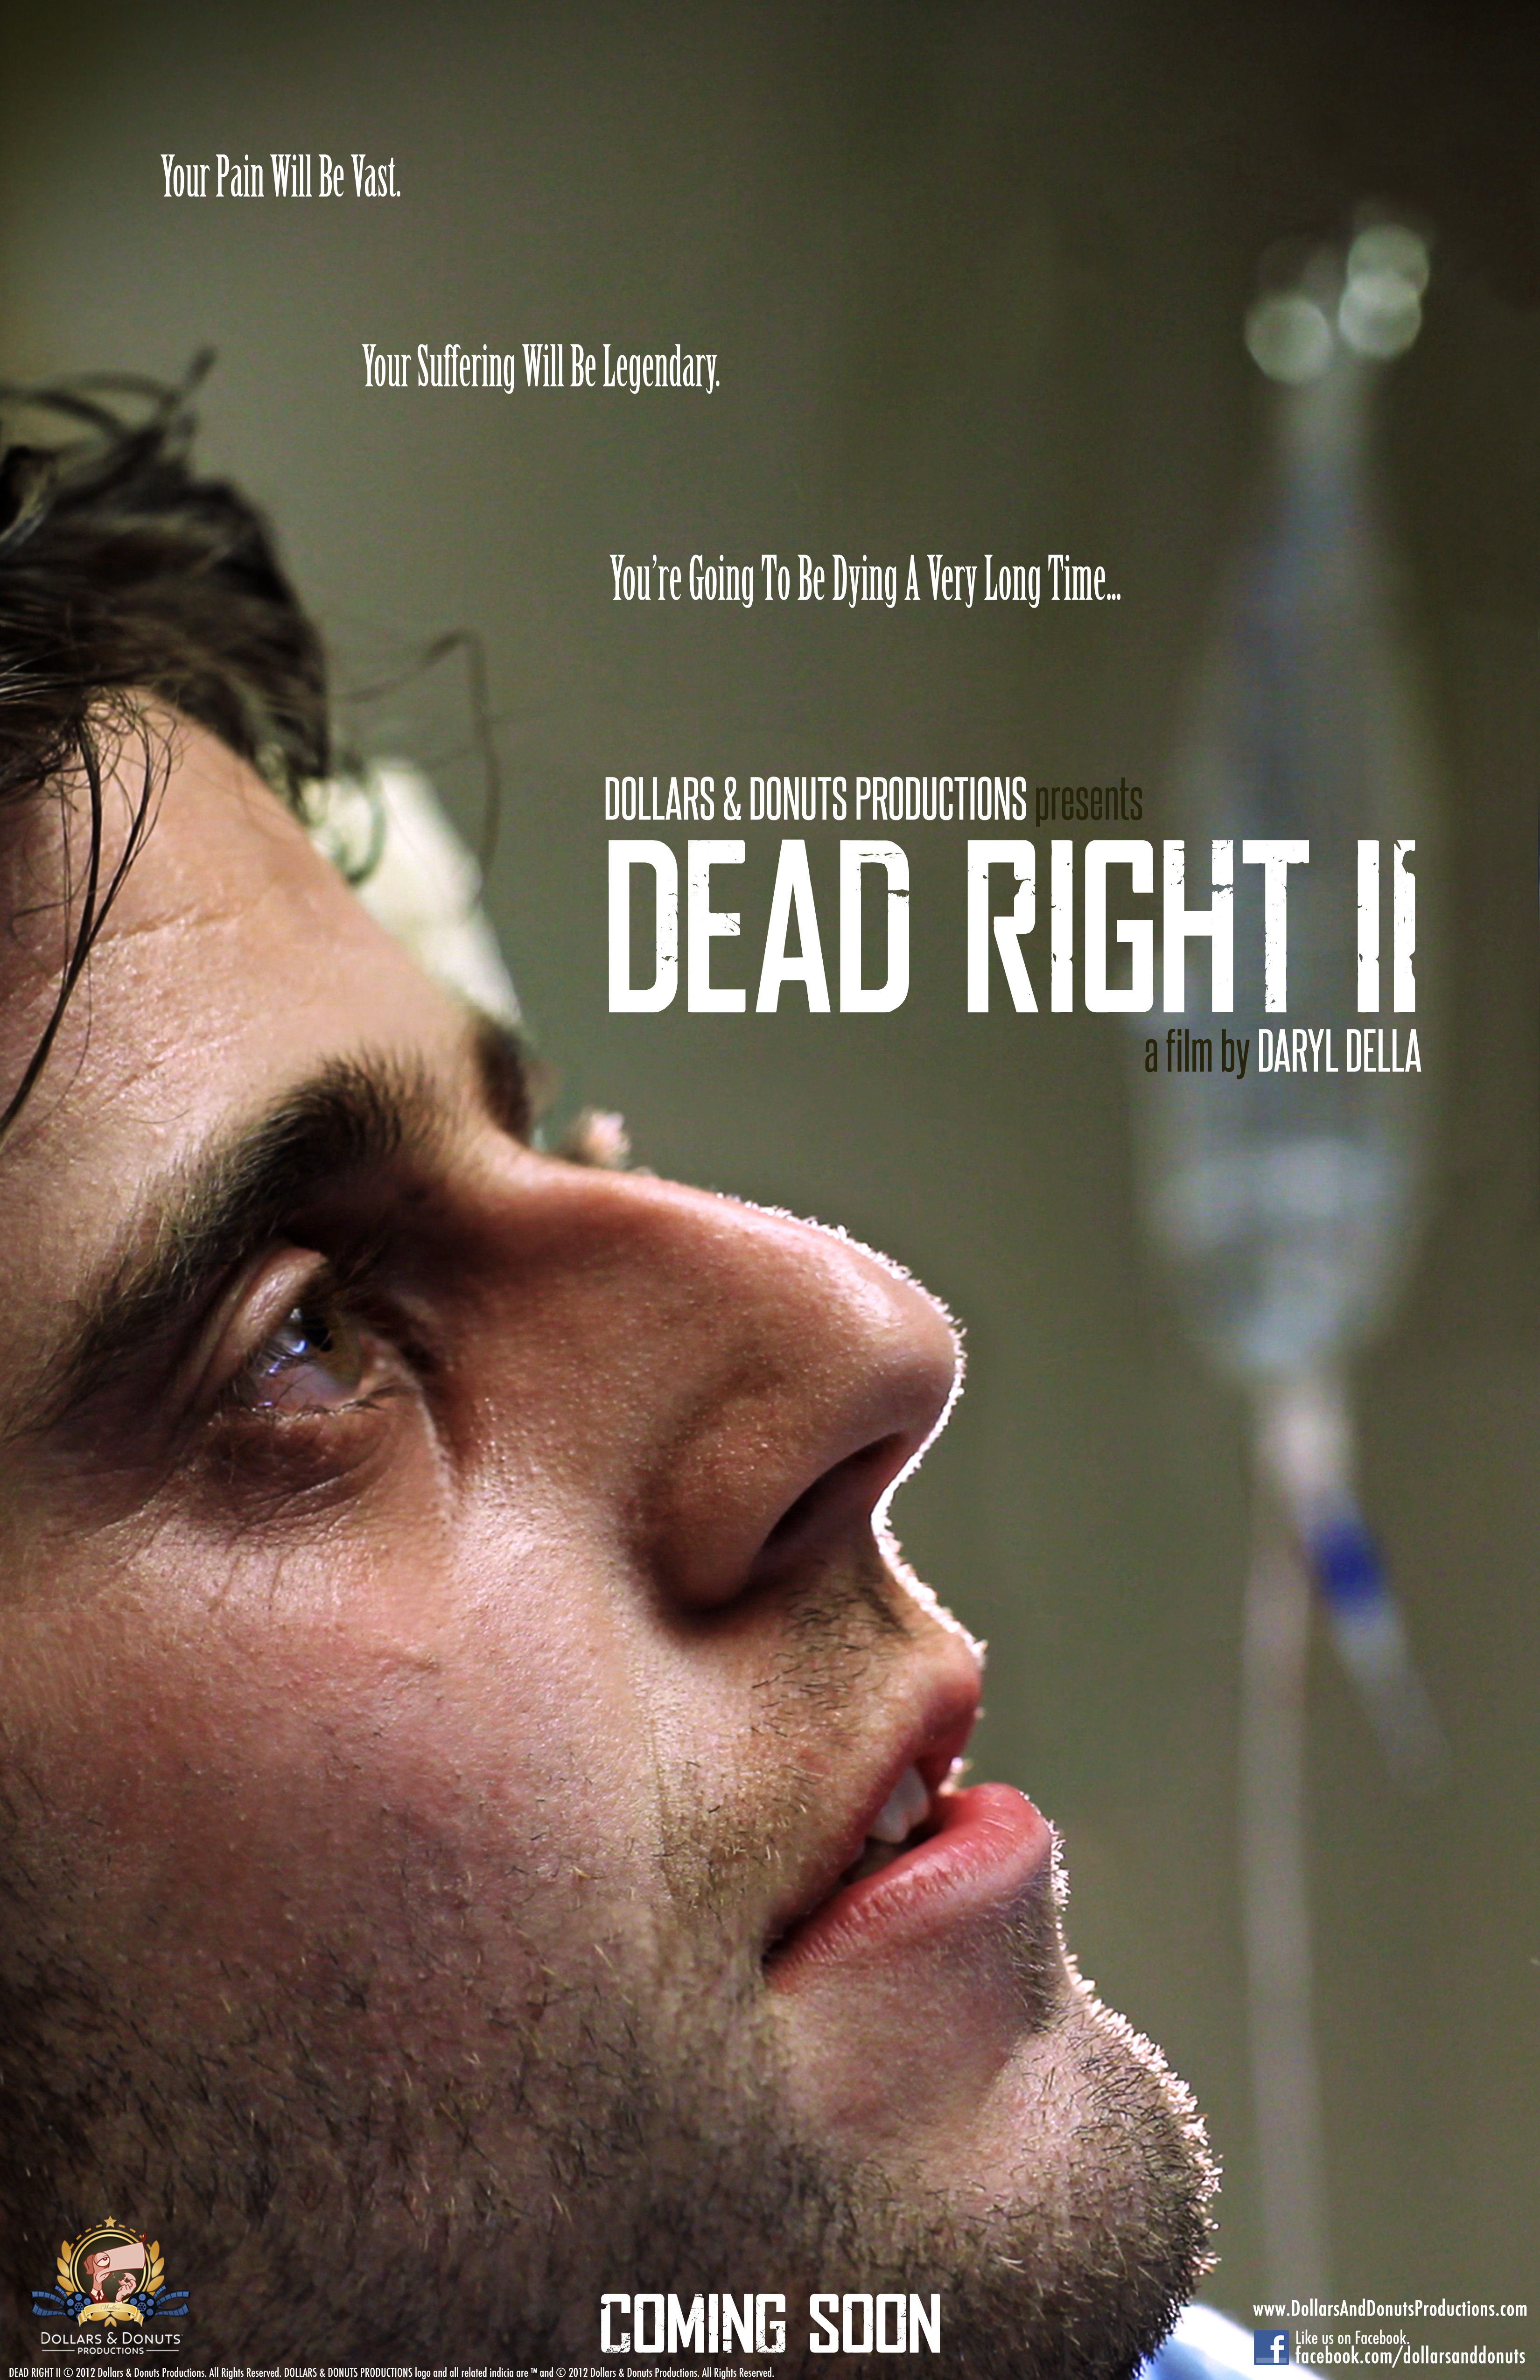 Dead Right II Teaser Poster